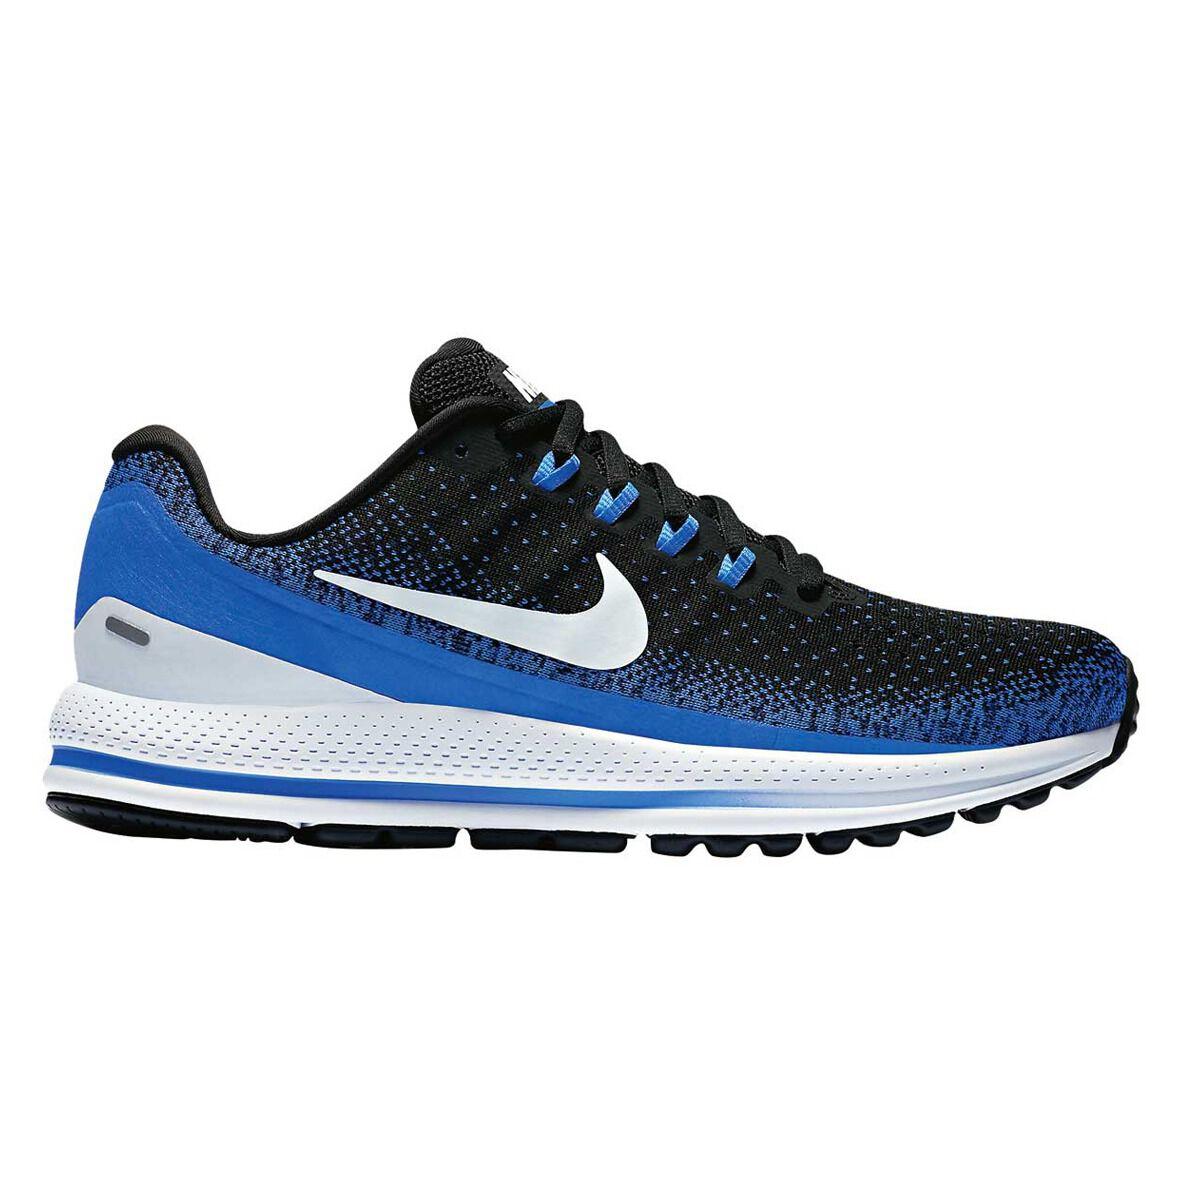 9cc4f526e1e3 ... coupon for nike zoom vomero 13 mens running shoes black us 8 black  rebelhi res 7e0a0